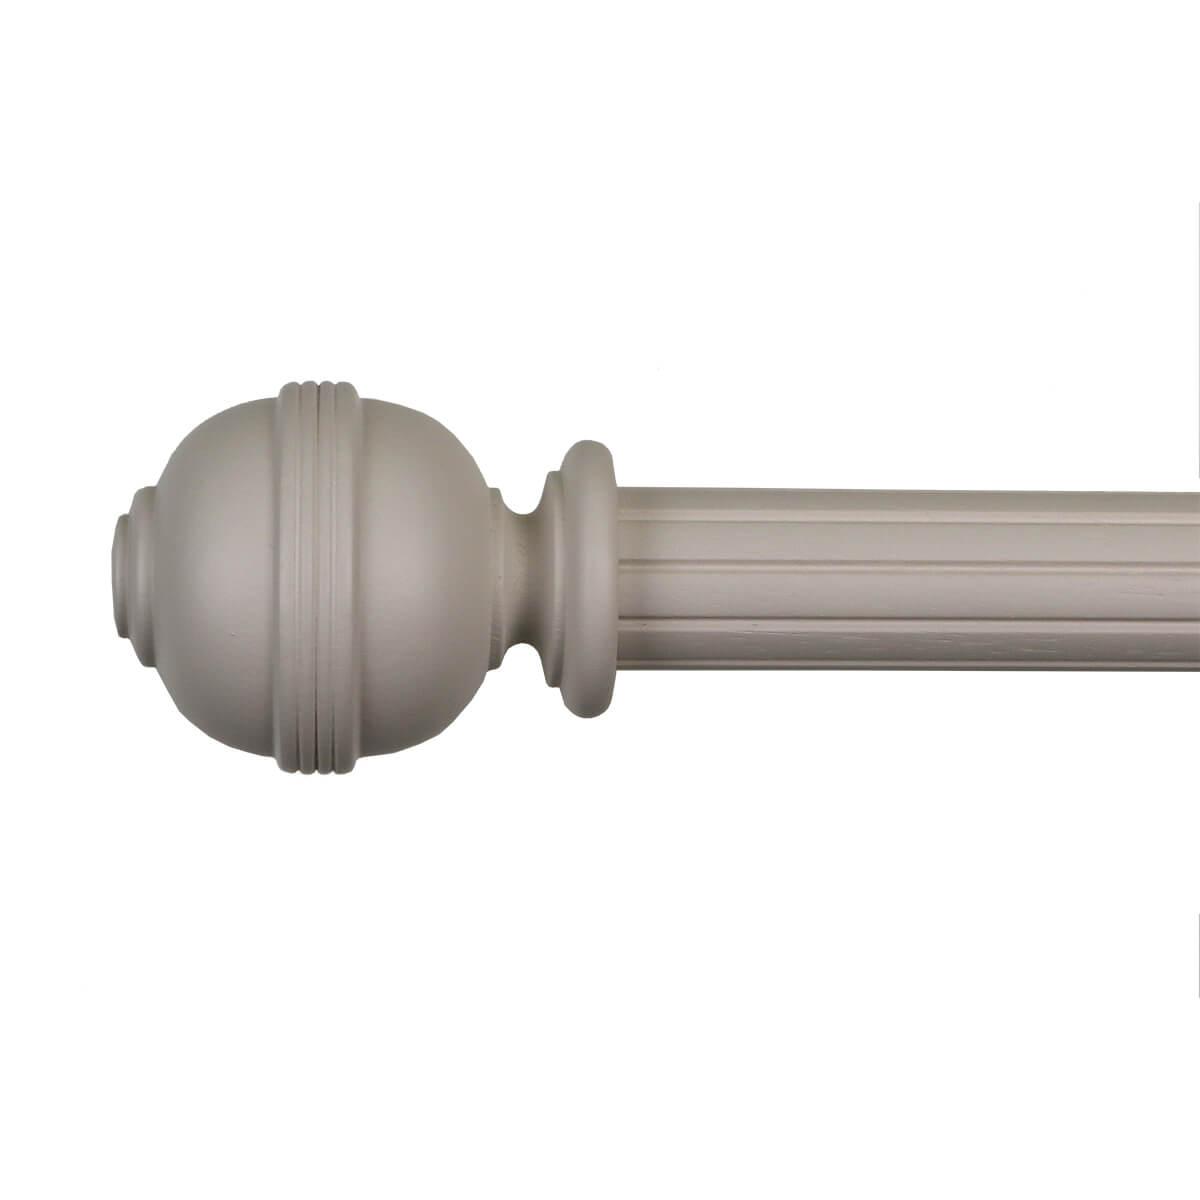 Aristocracy 35mm Pole